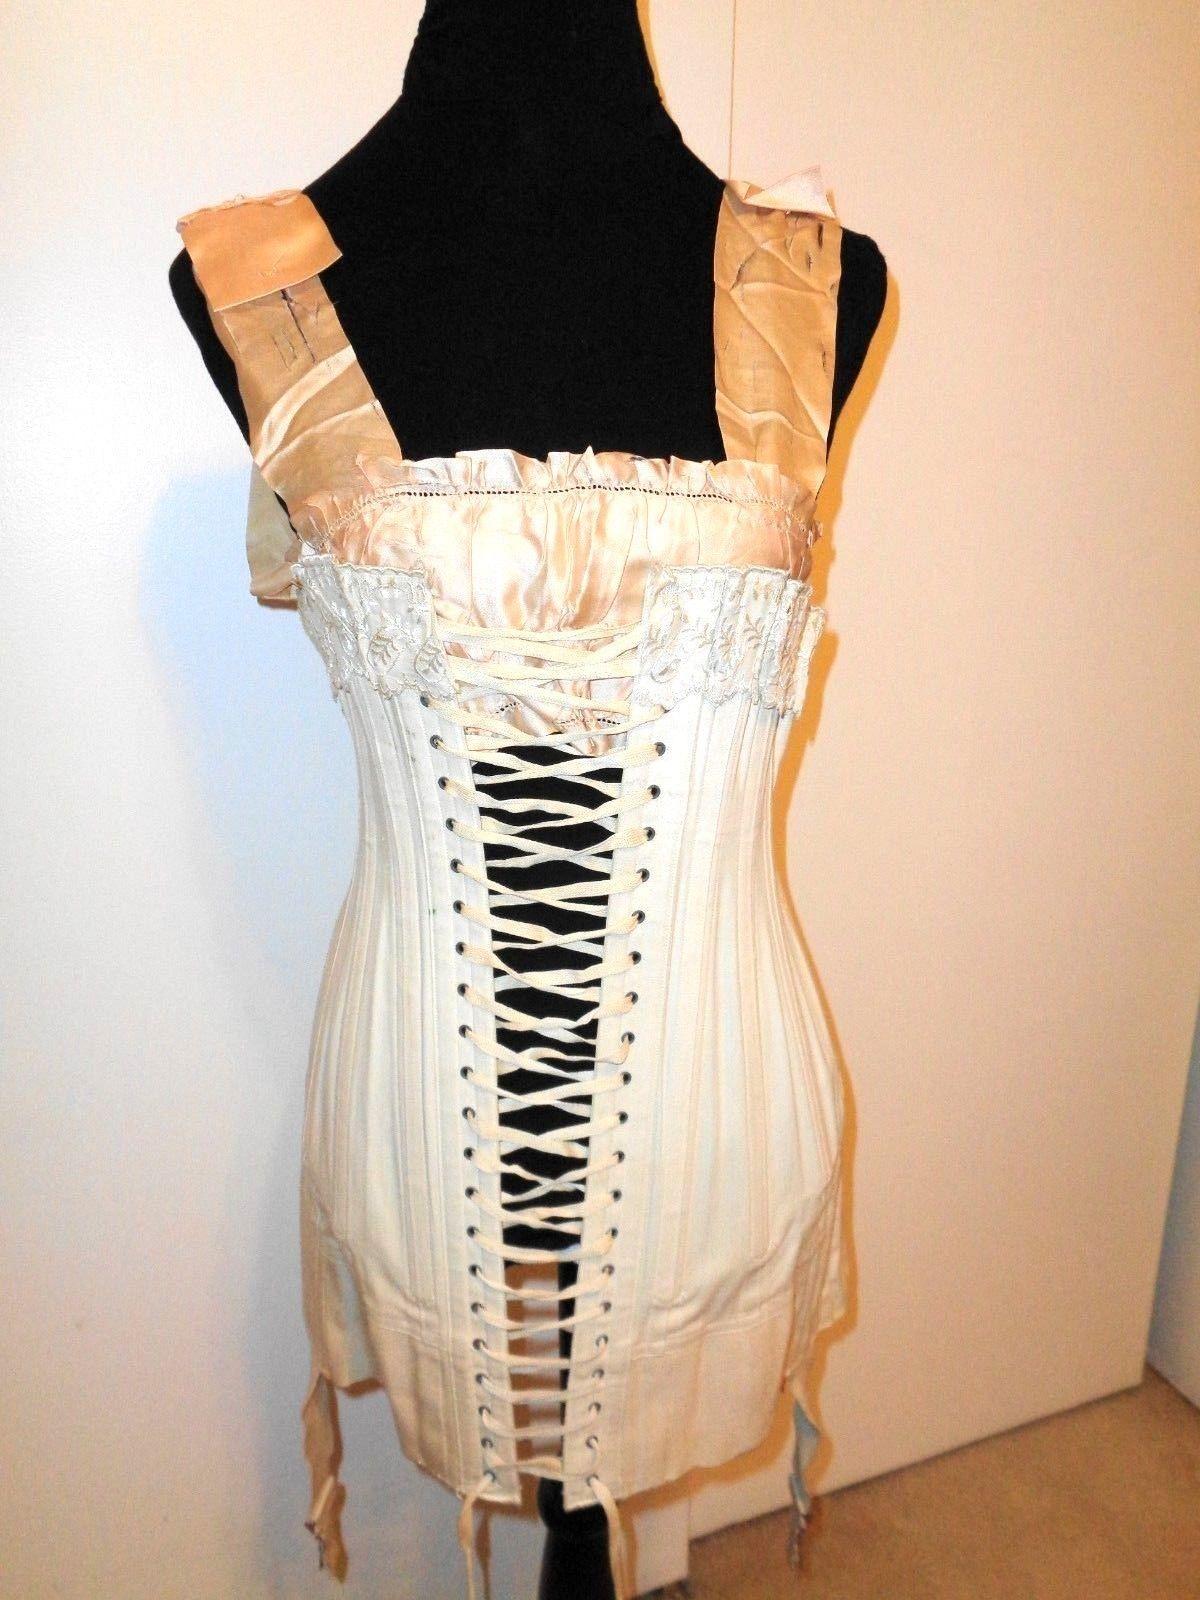 767d44bdf8a Antique Victorian - Edwardian Wilhelmina White Lace and Linen Bone Corset  with Peach Satin Camisole